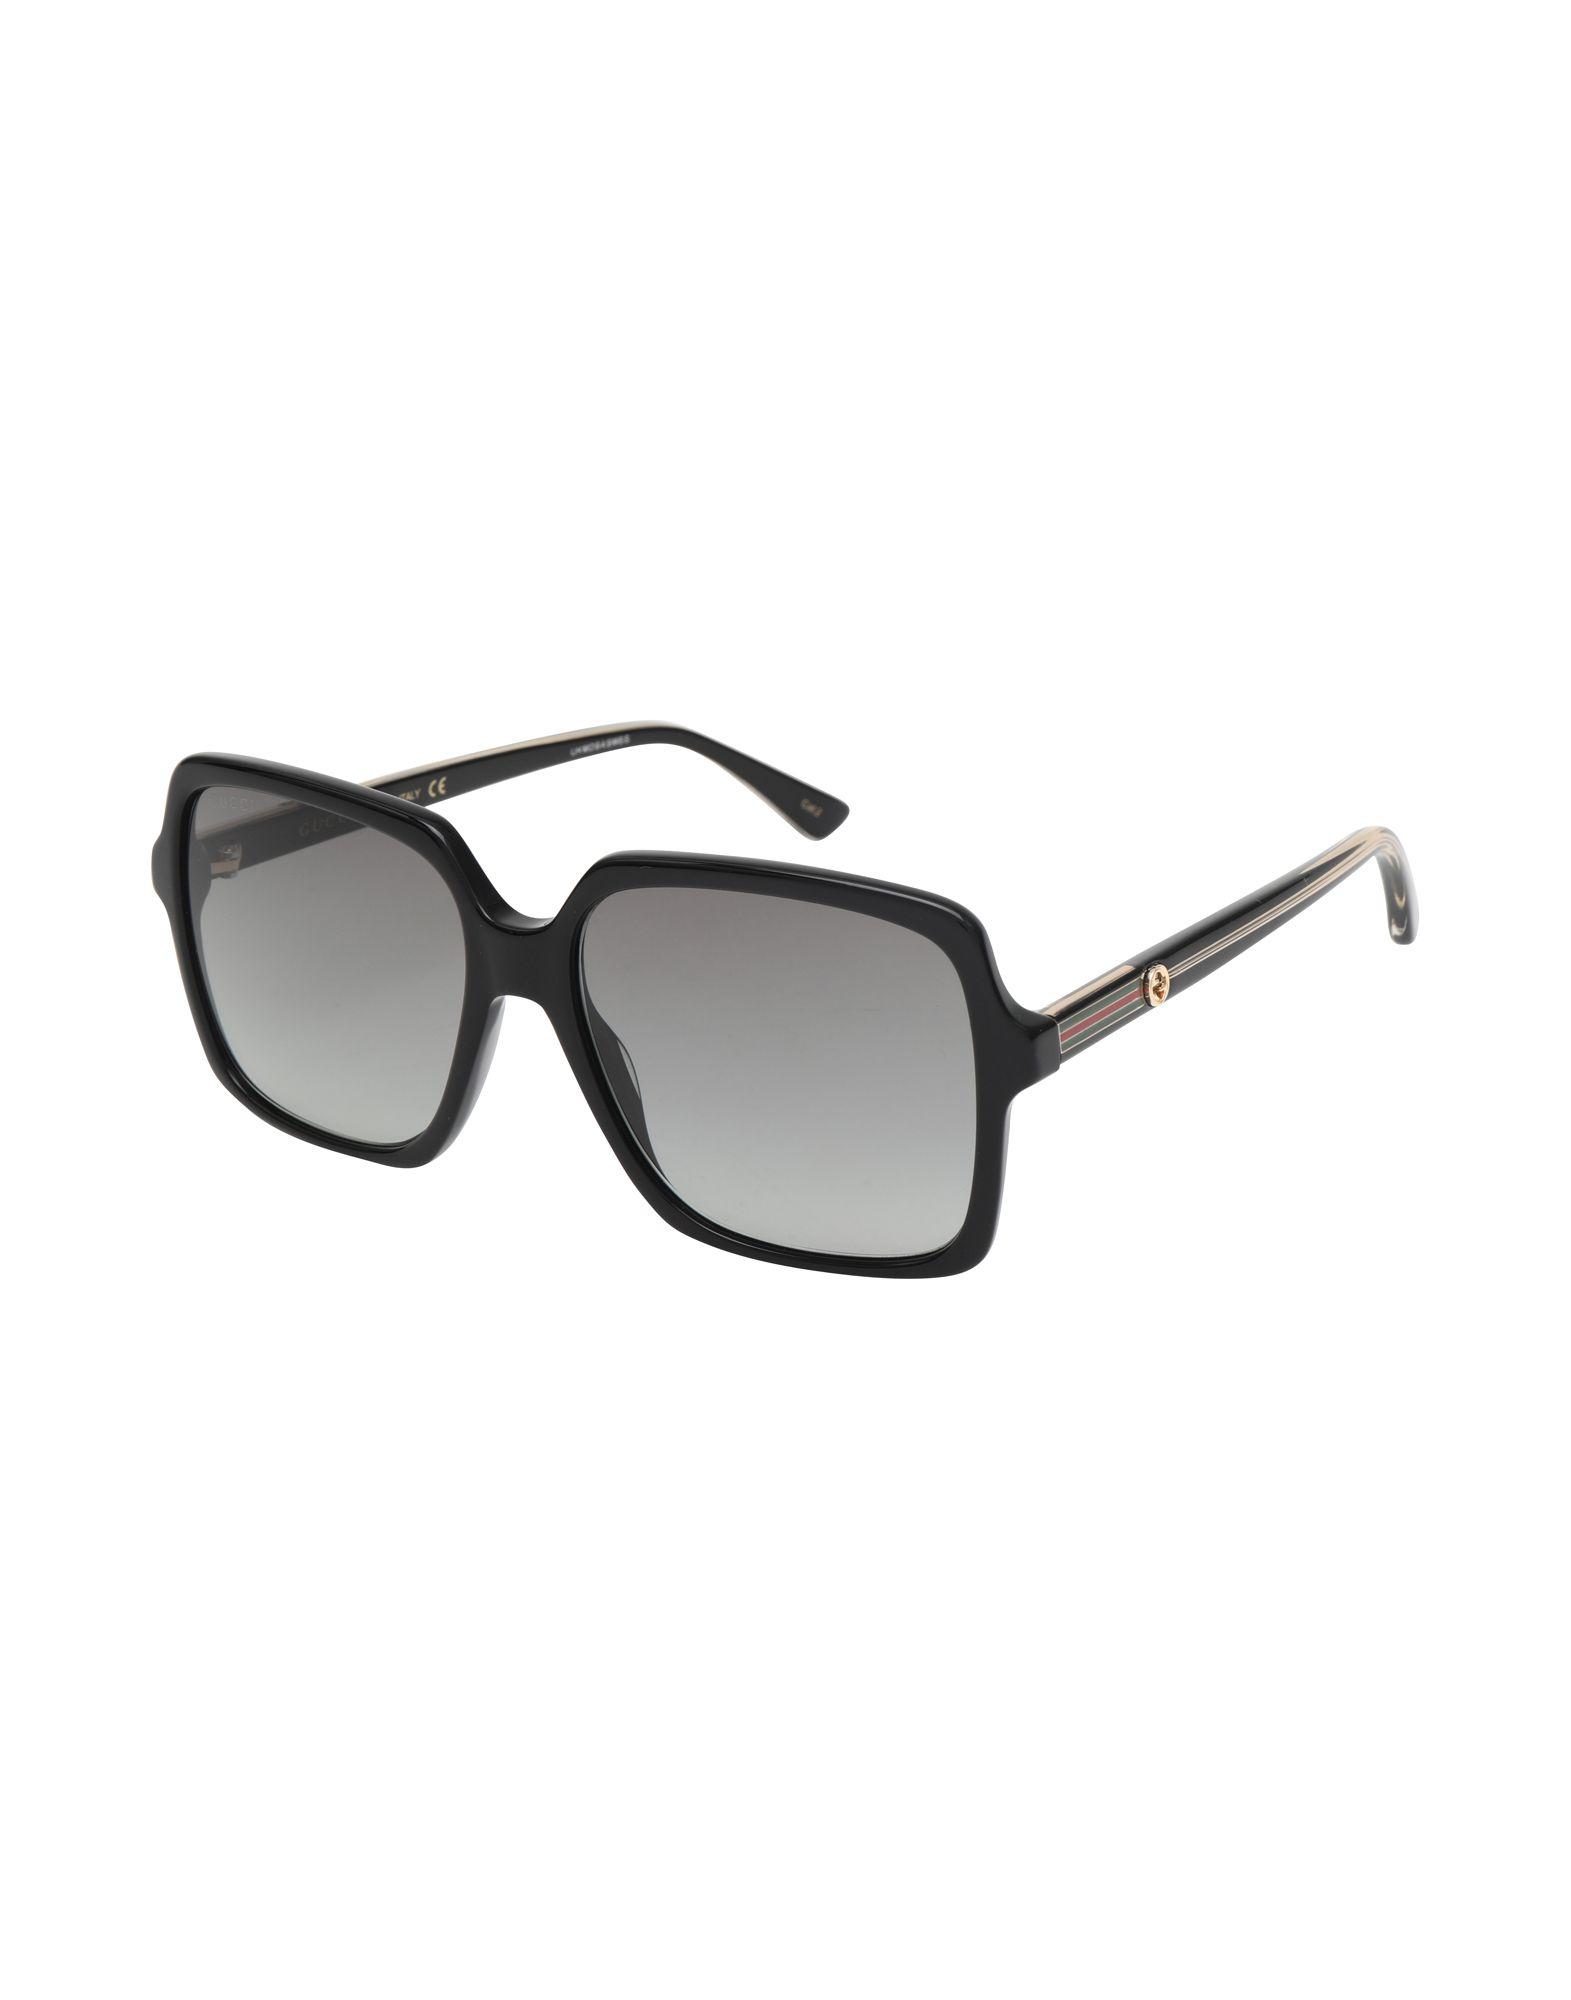 db942b25804f4 Gucci Gg0375s-001 - Sunglasses - Women Gucci Sunglasses online on ...